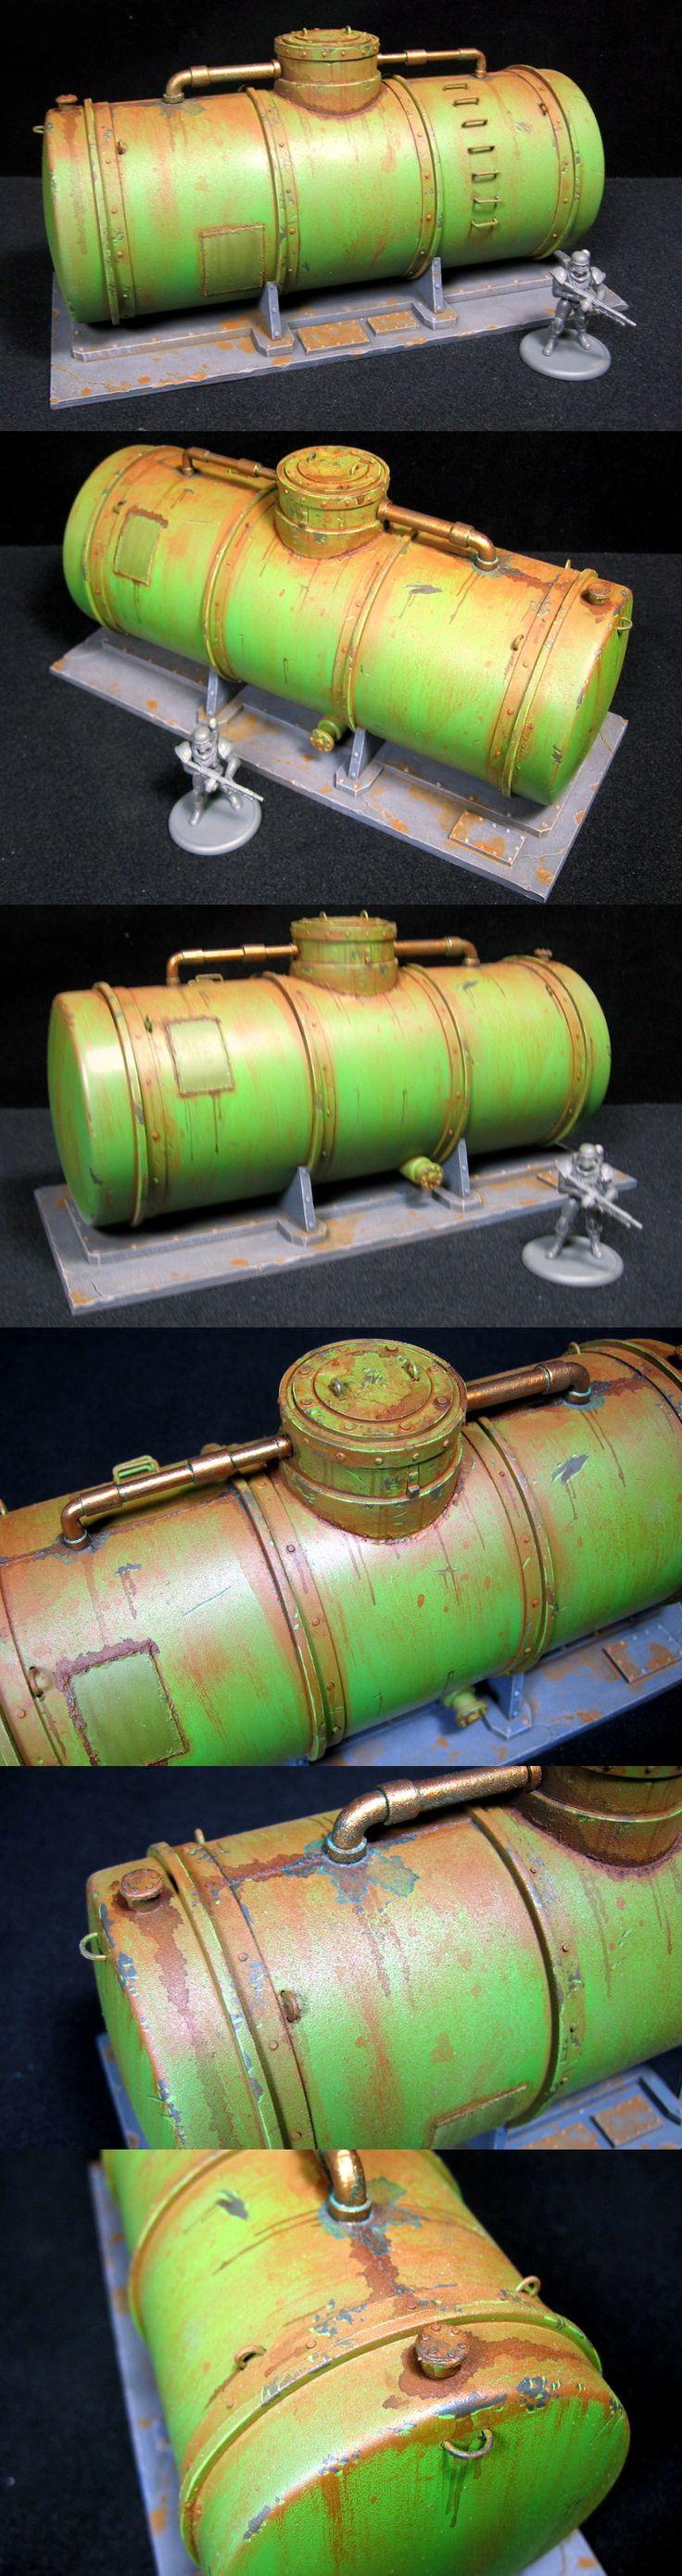 Fuel Tank                                                                                                                                                                                 More